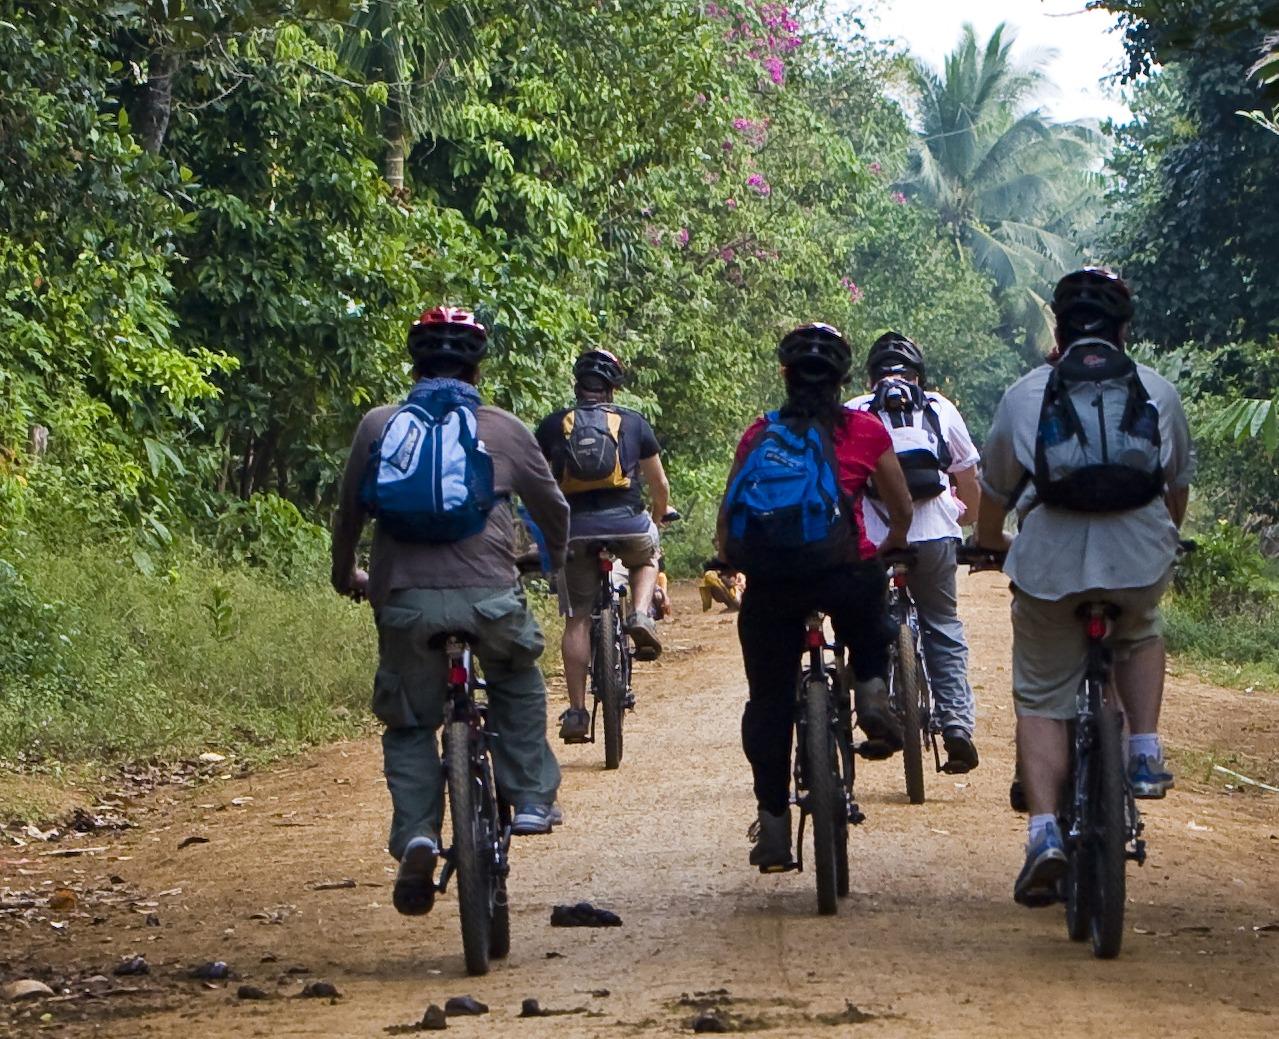 Community-Based Ecotourism in Chi Phat - Mountain biking